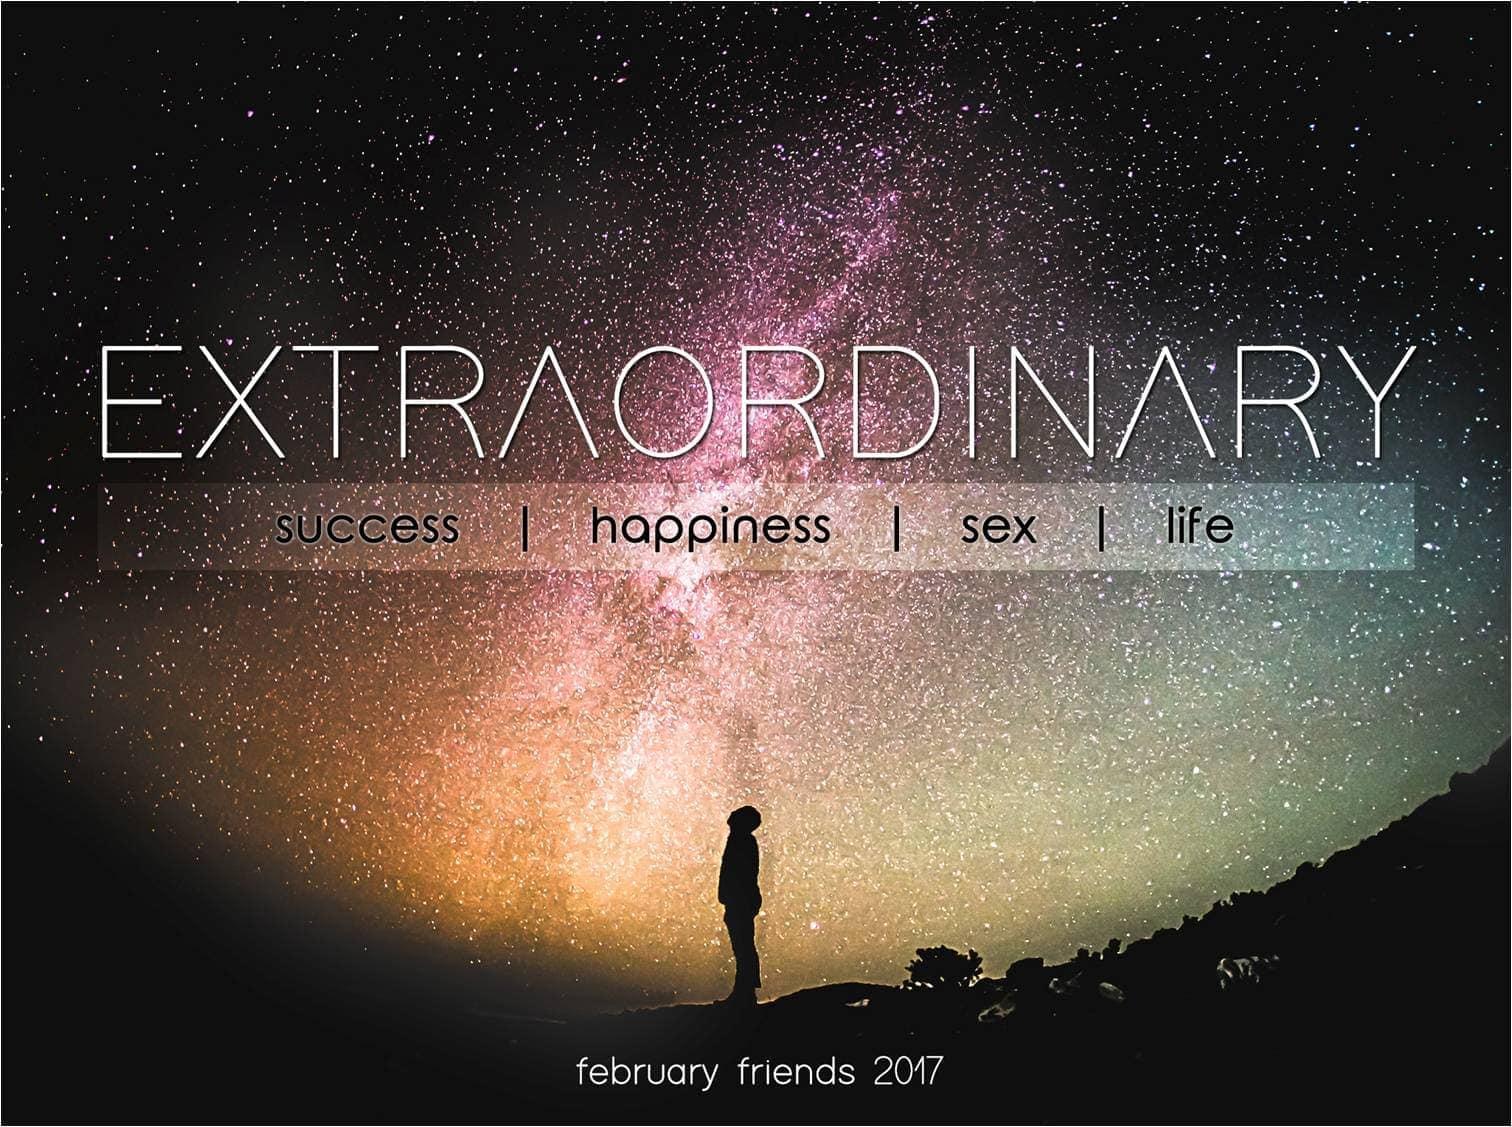 Feb Friends 2017: Extraordinary